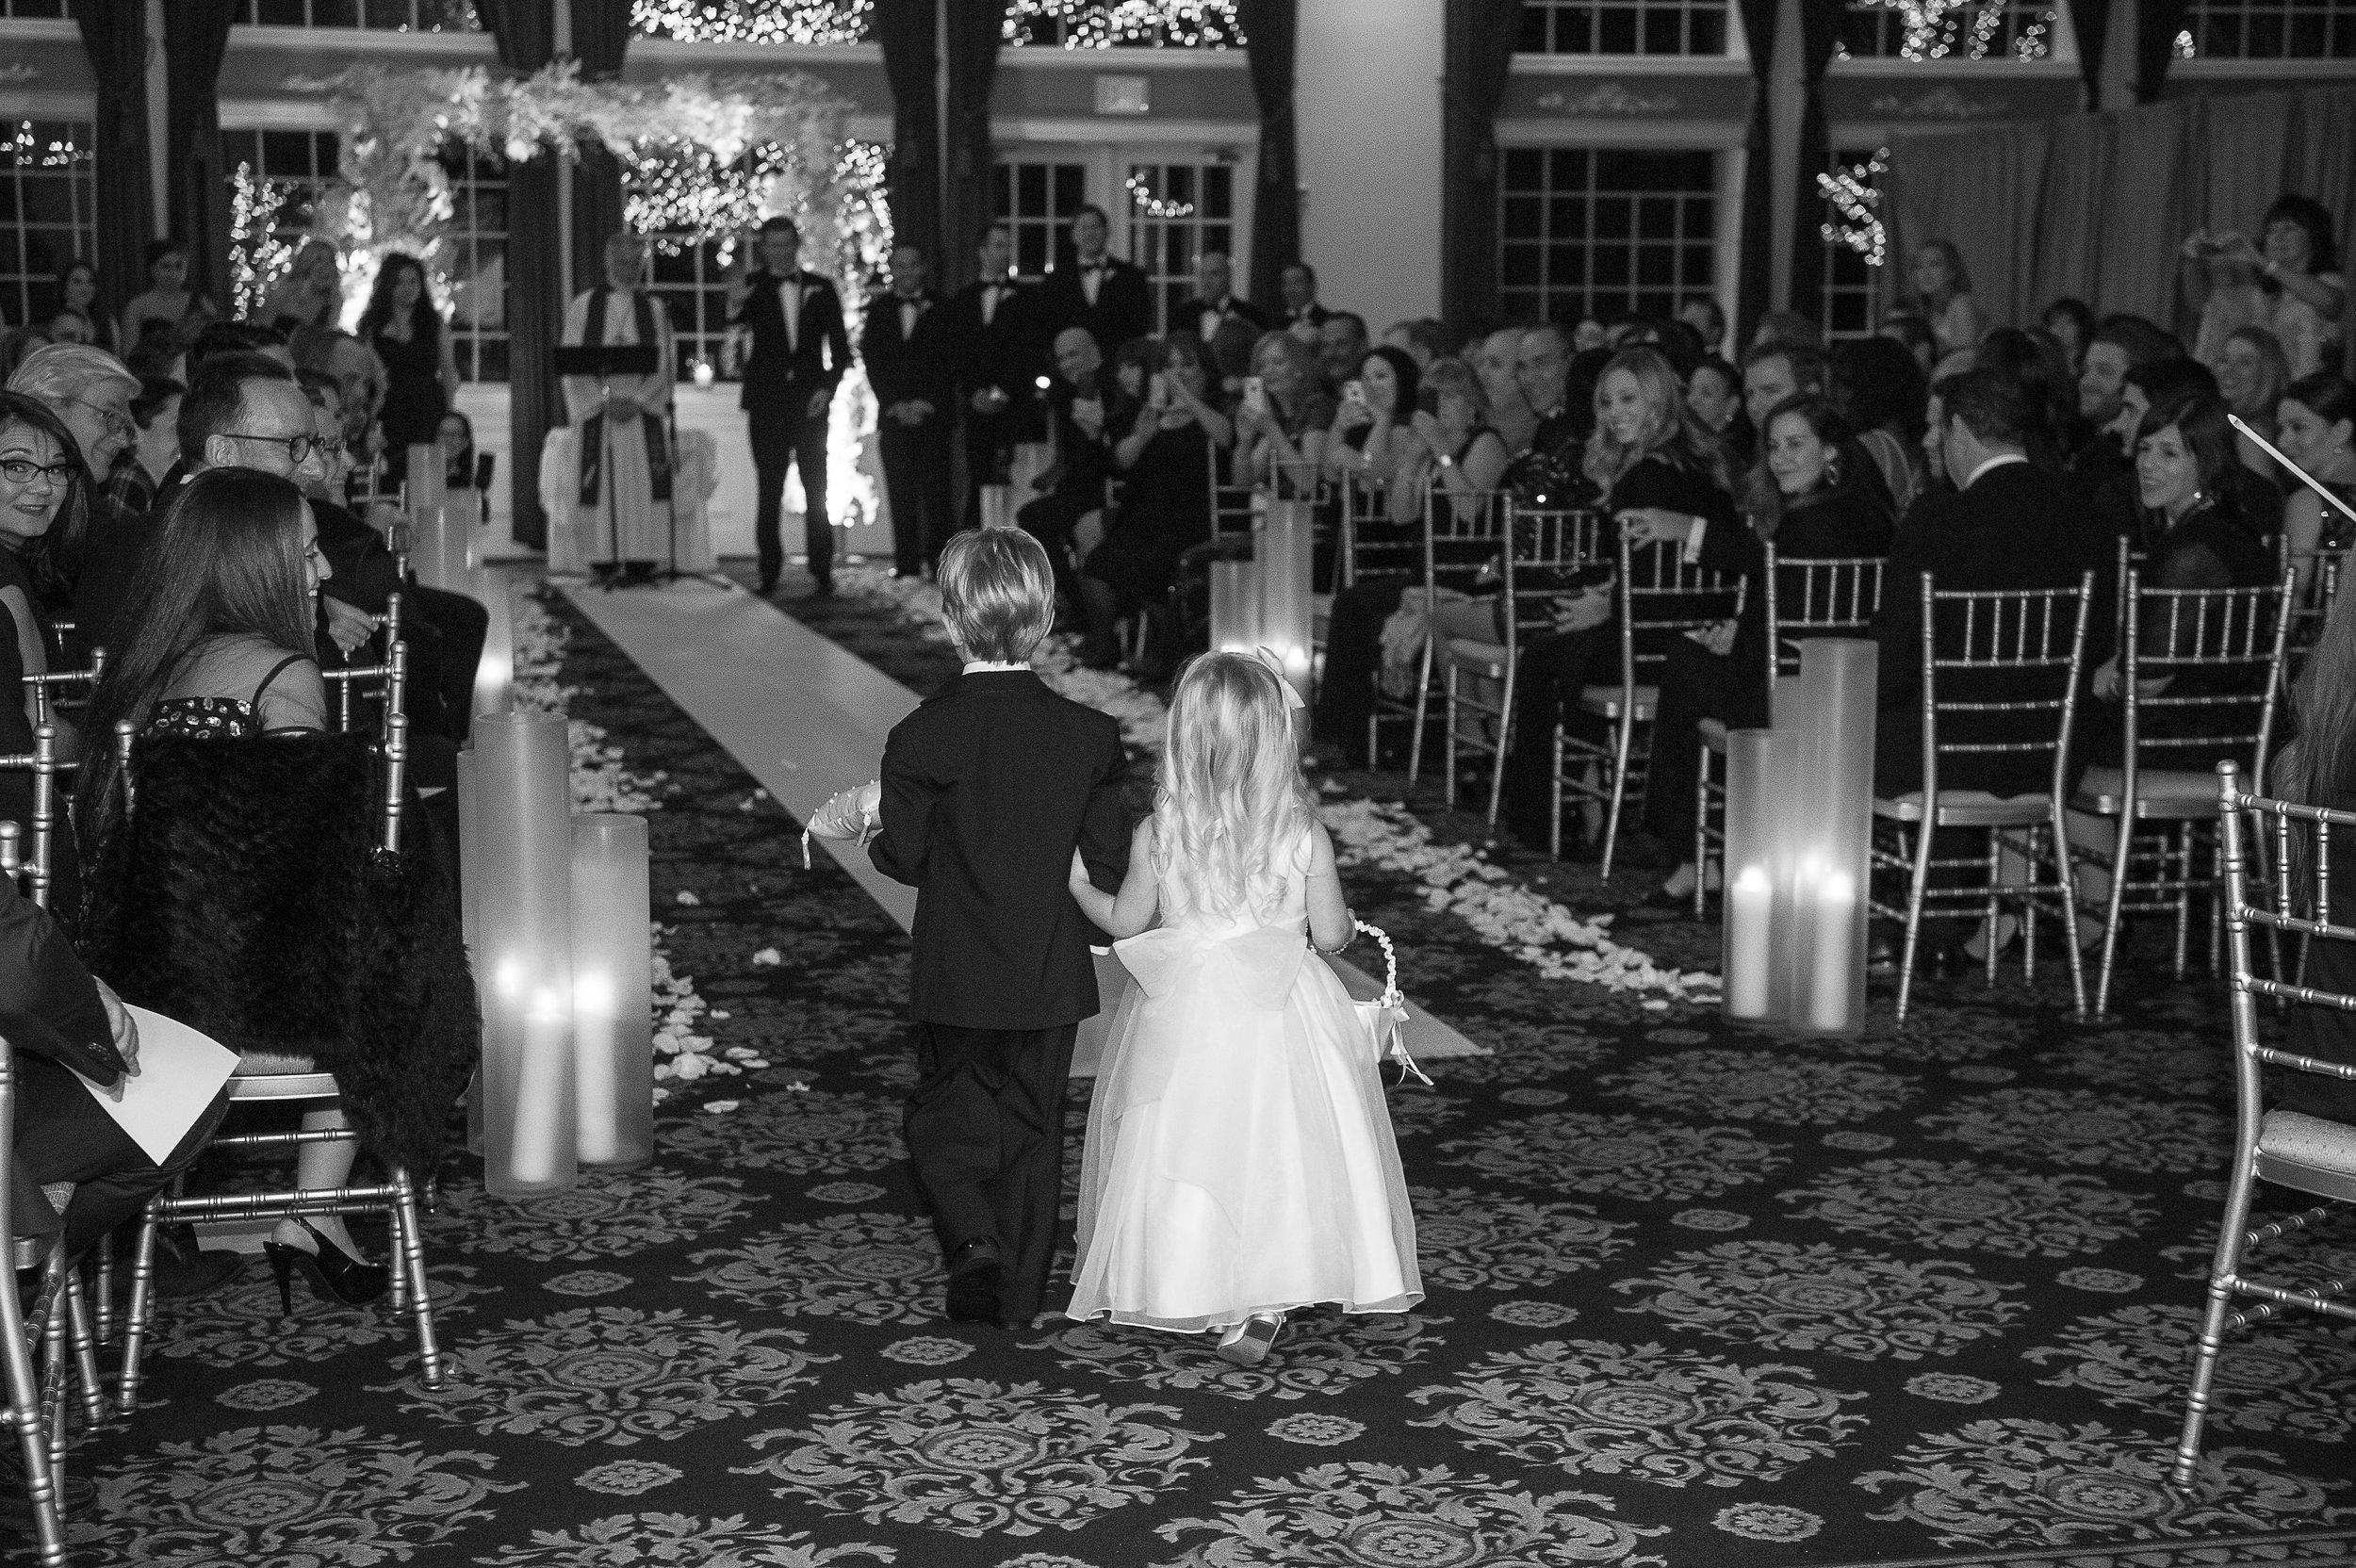 Ceci_New_York_Custom_Invitation_ New_Jersey_Wedding_Luxury_Personalized_Ceci_Style_Bride_Foil_Stamping107.JPG